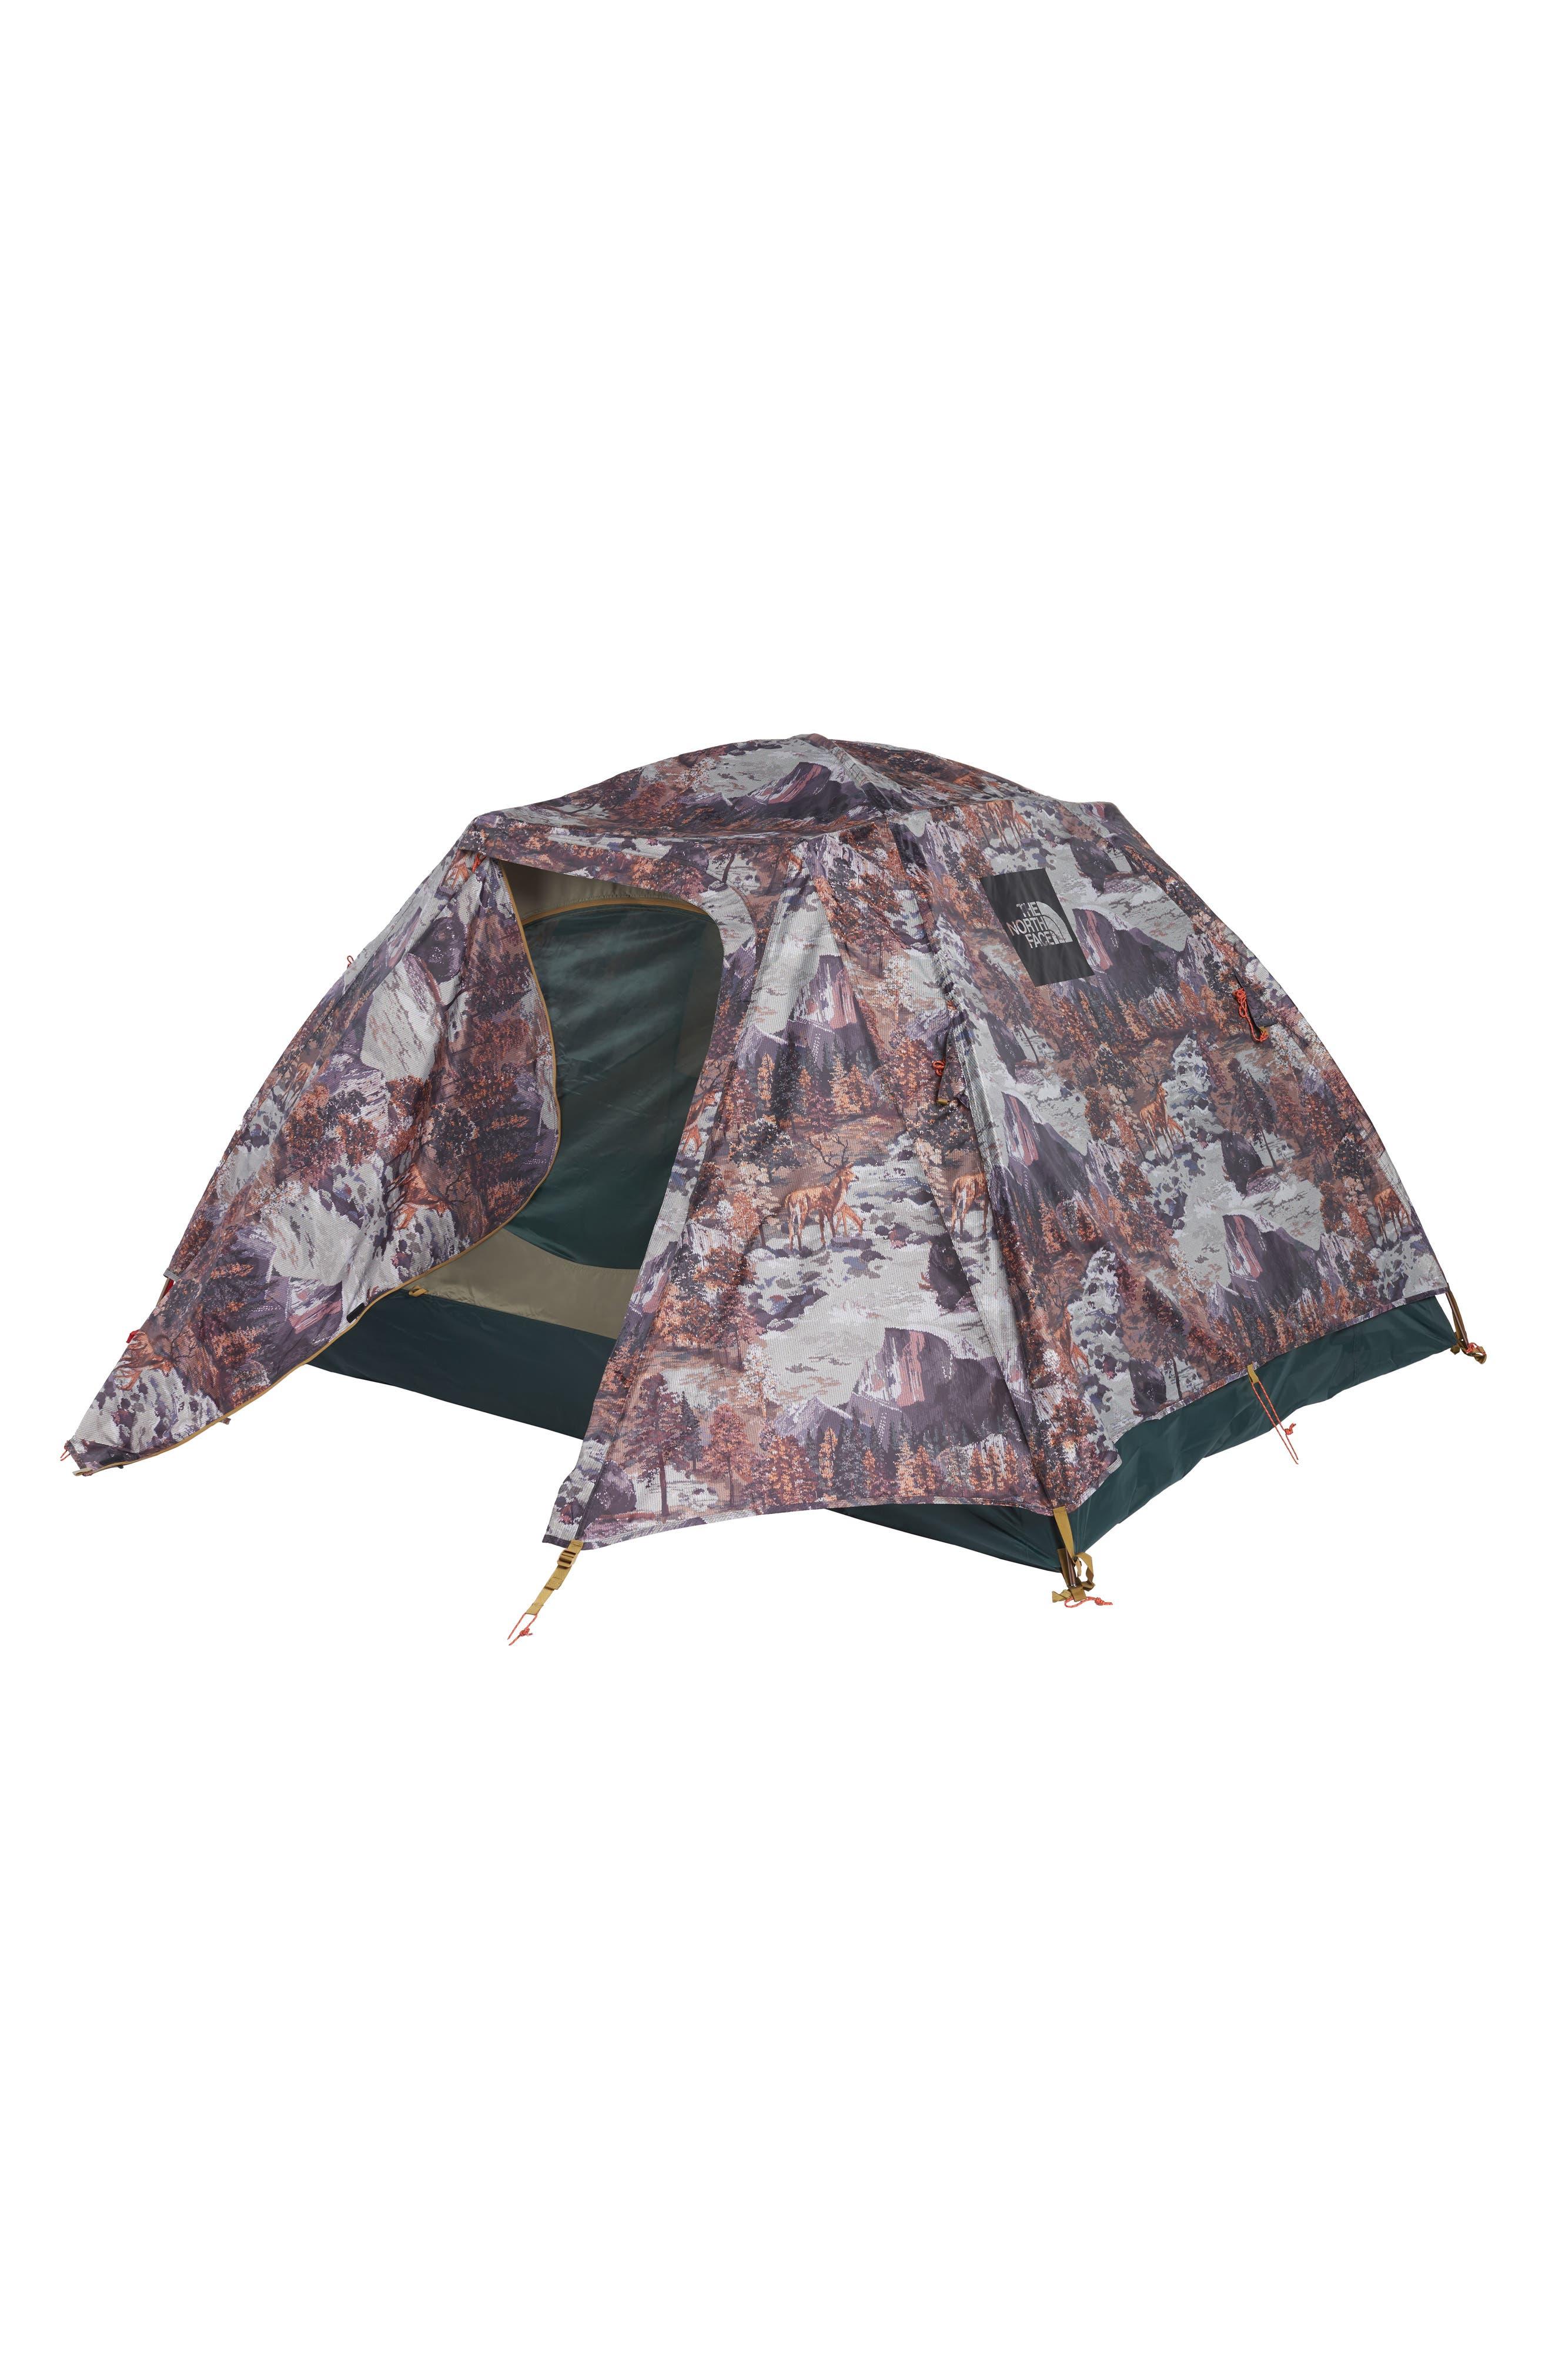 Homestead Roomy 2 Tent,                         Main,                         color, DARKEST SPRUCE